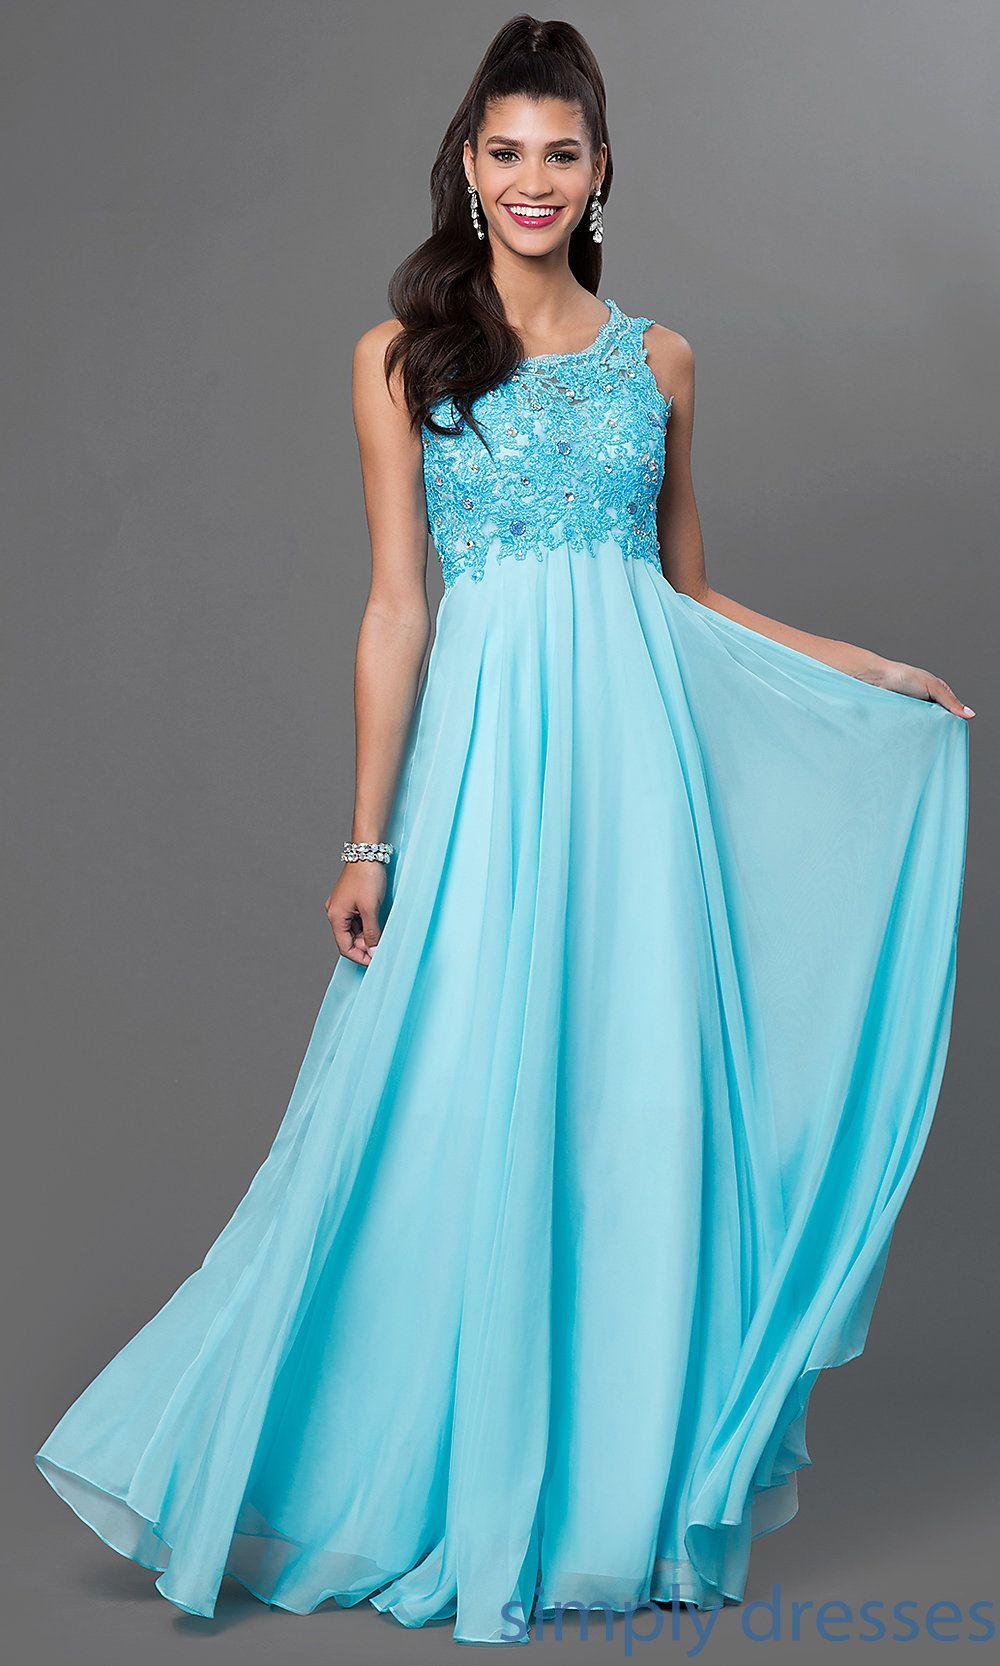 Dresses, Formal, Prom Dresses, Evening Wear: Floor Length Sleeveless ...